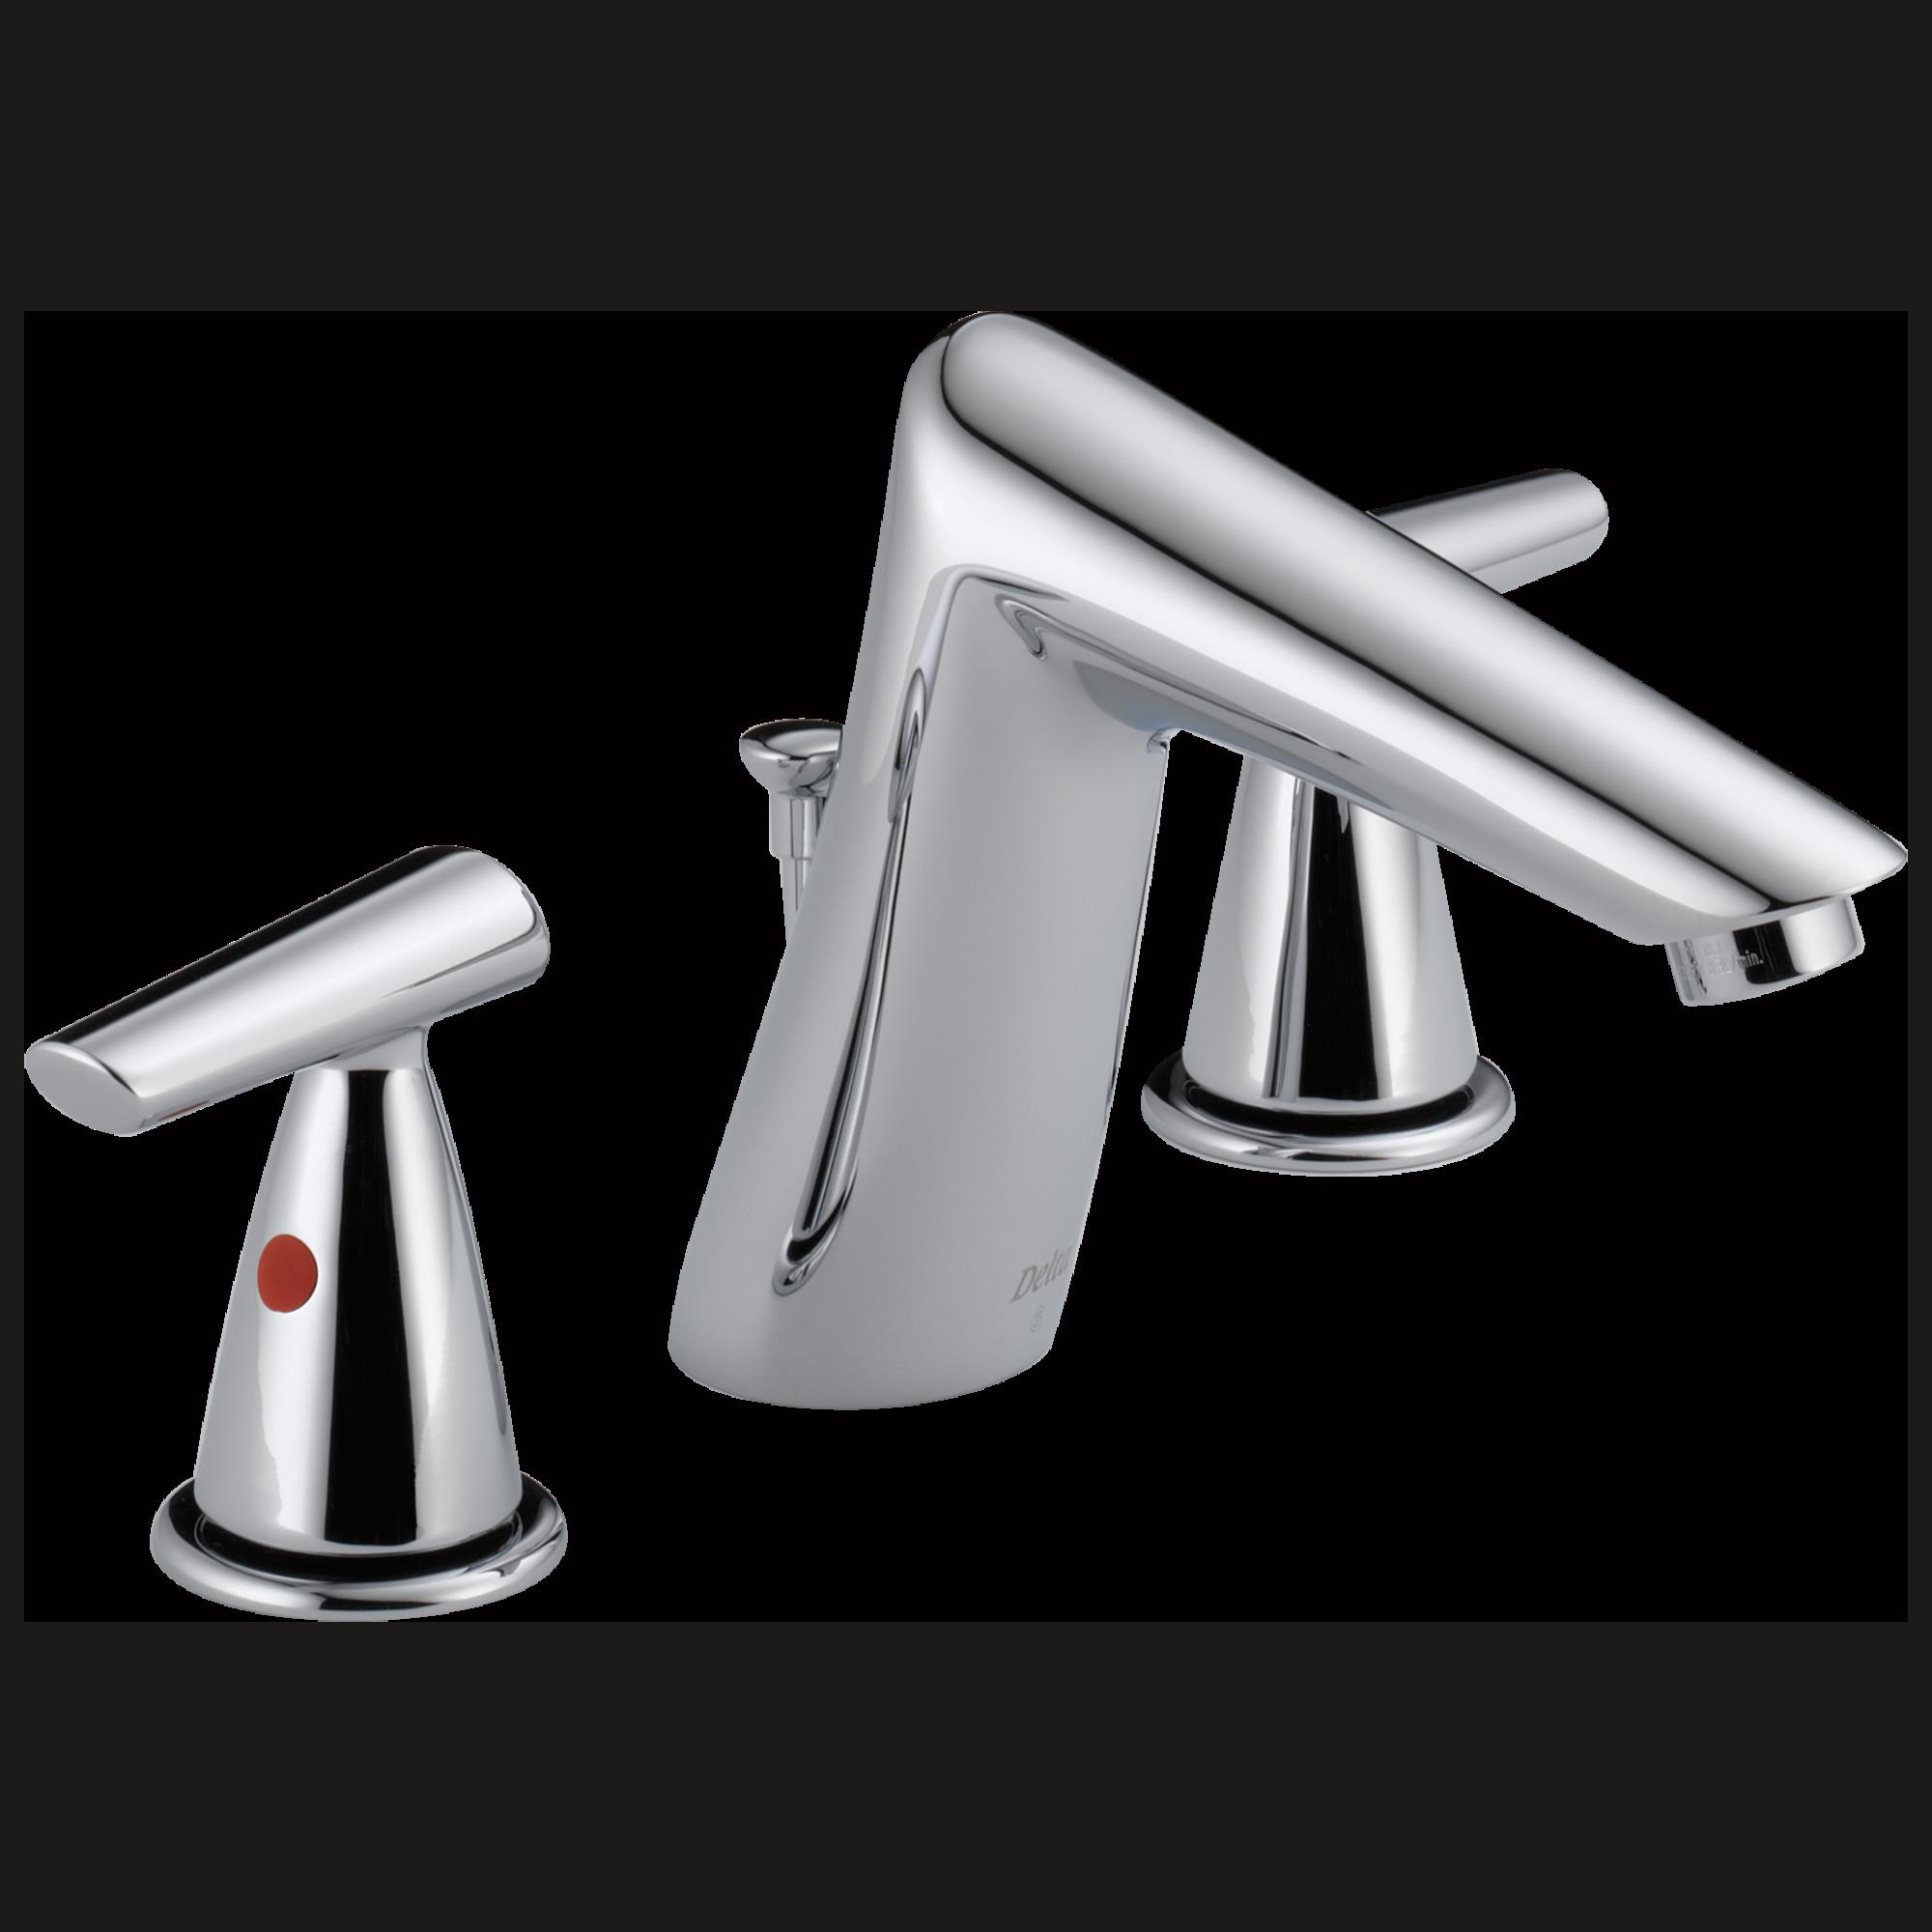 Delta 3582lf Mpu Rizu 2 Handle Widespread Lavatory Faucet Chrome Ebay